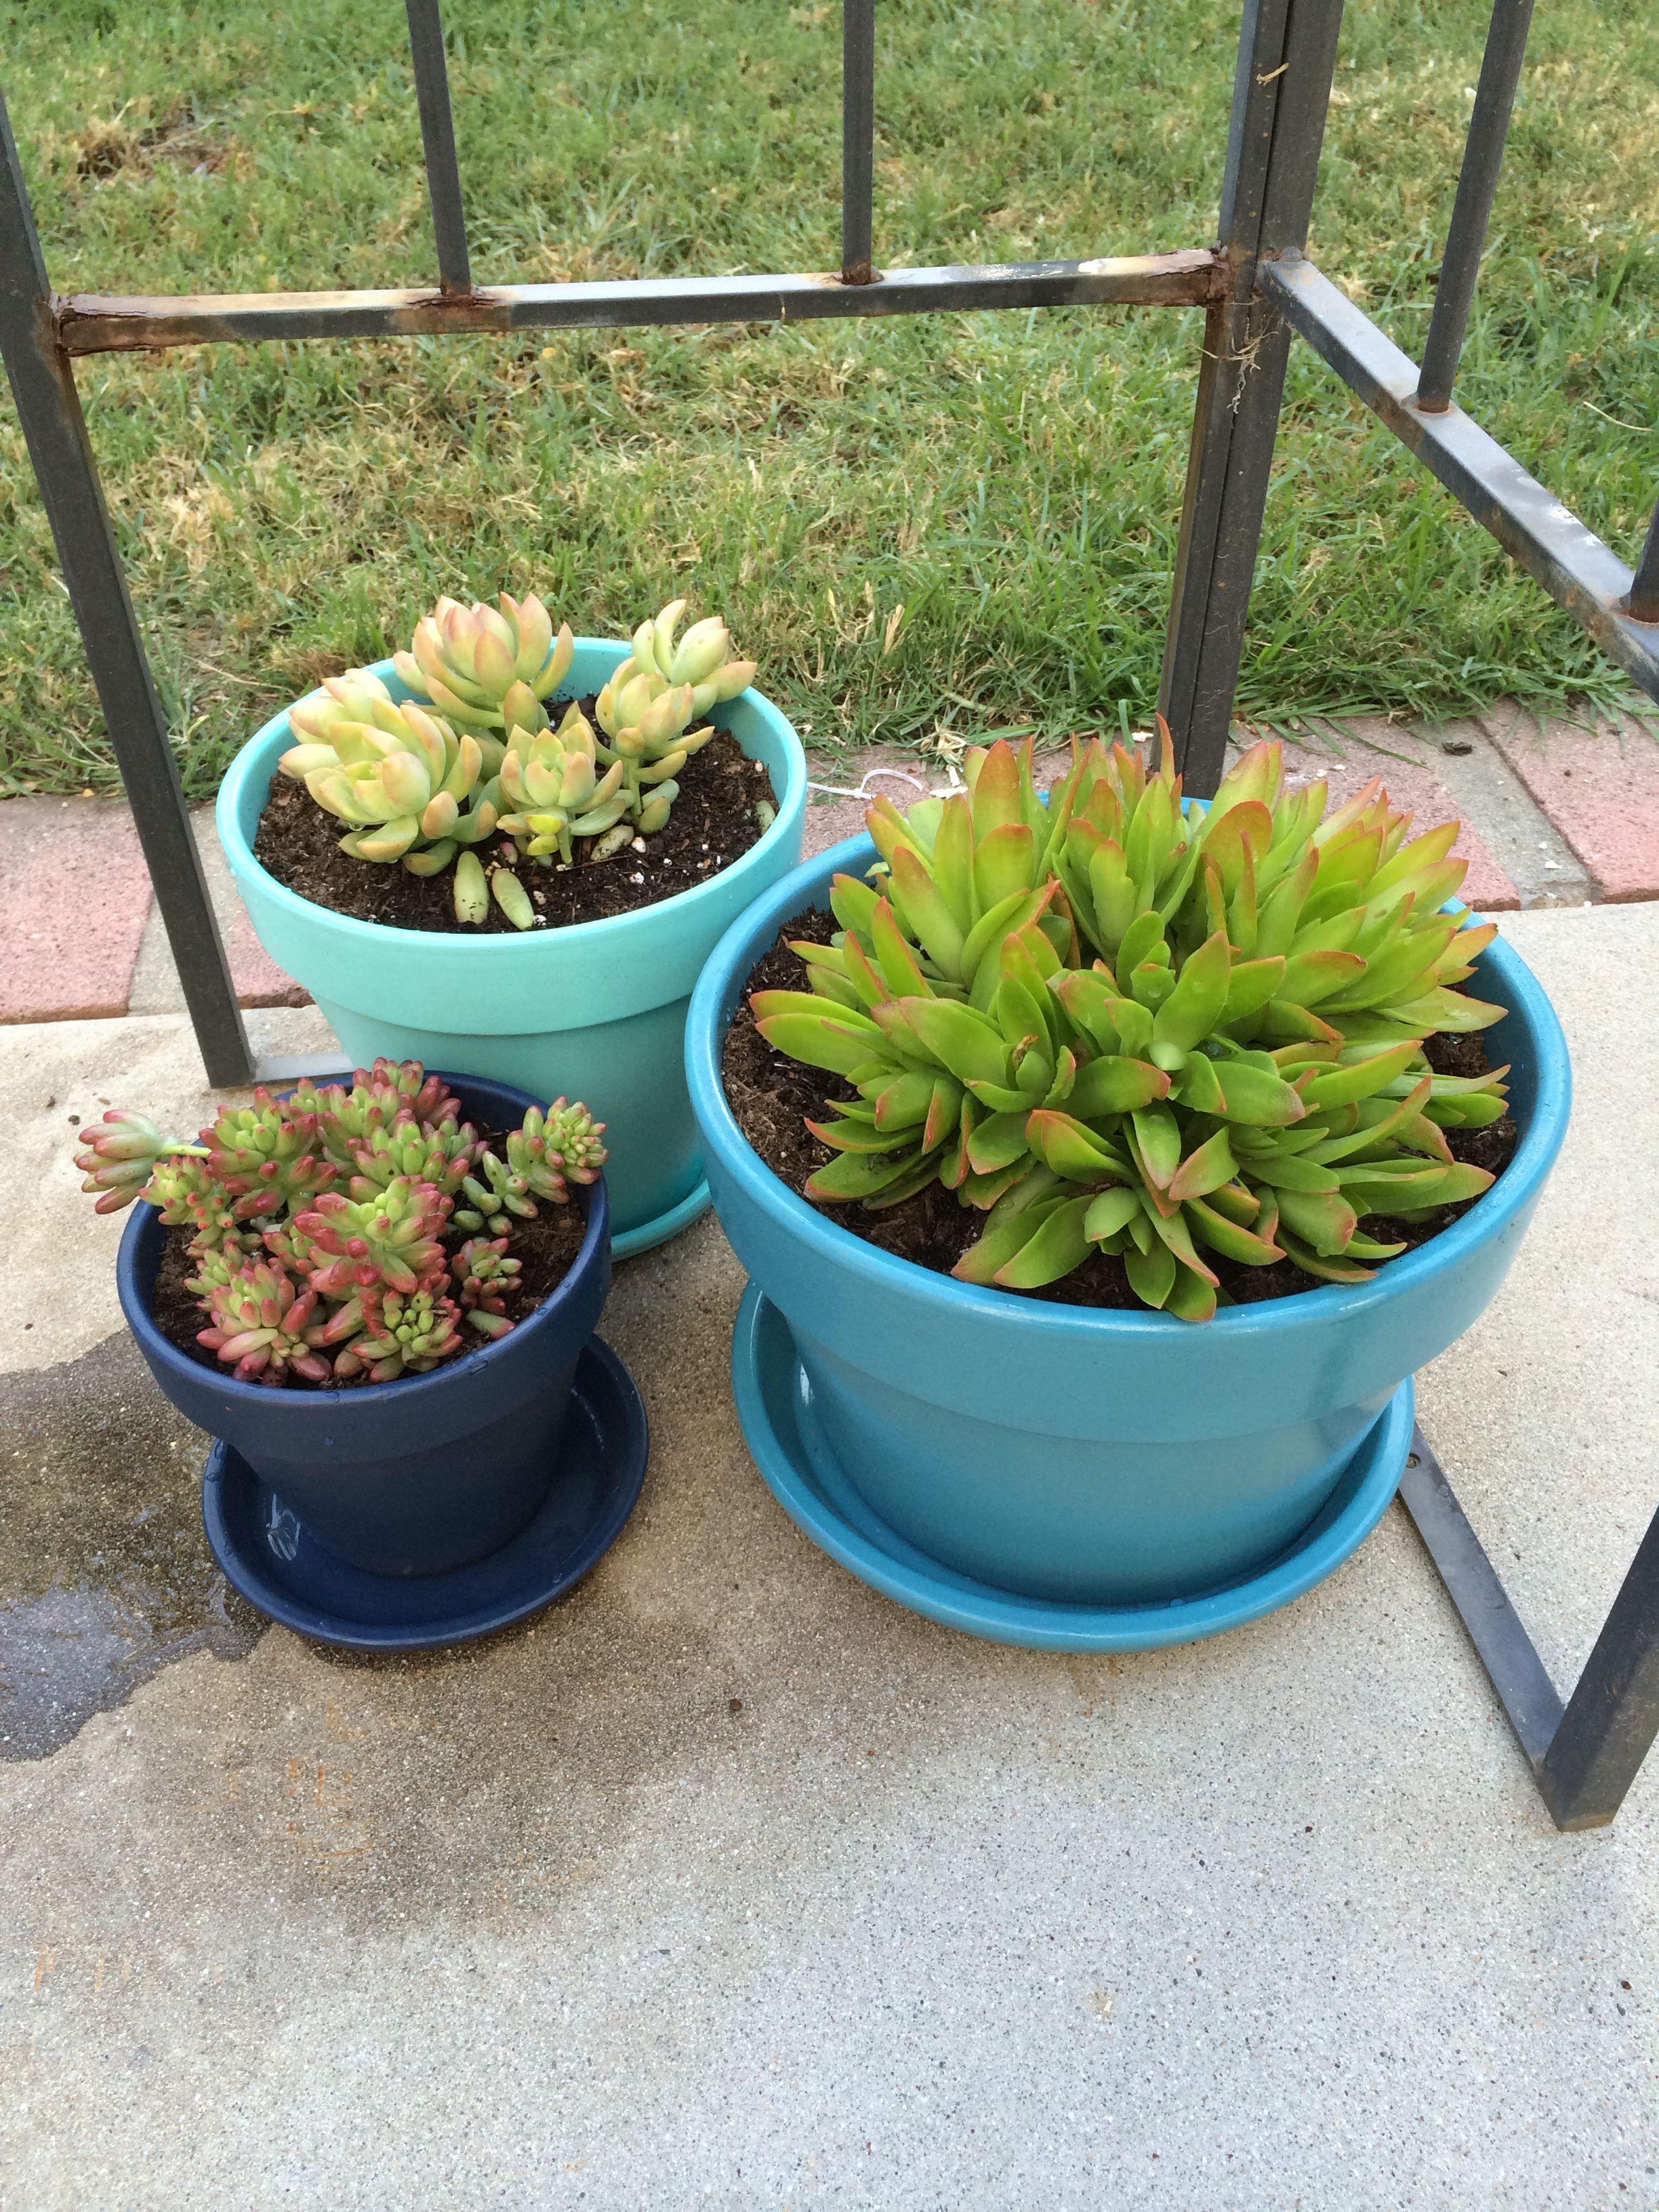 Spray paint flower pots